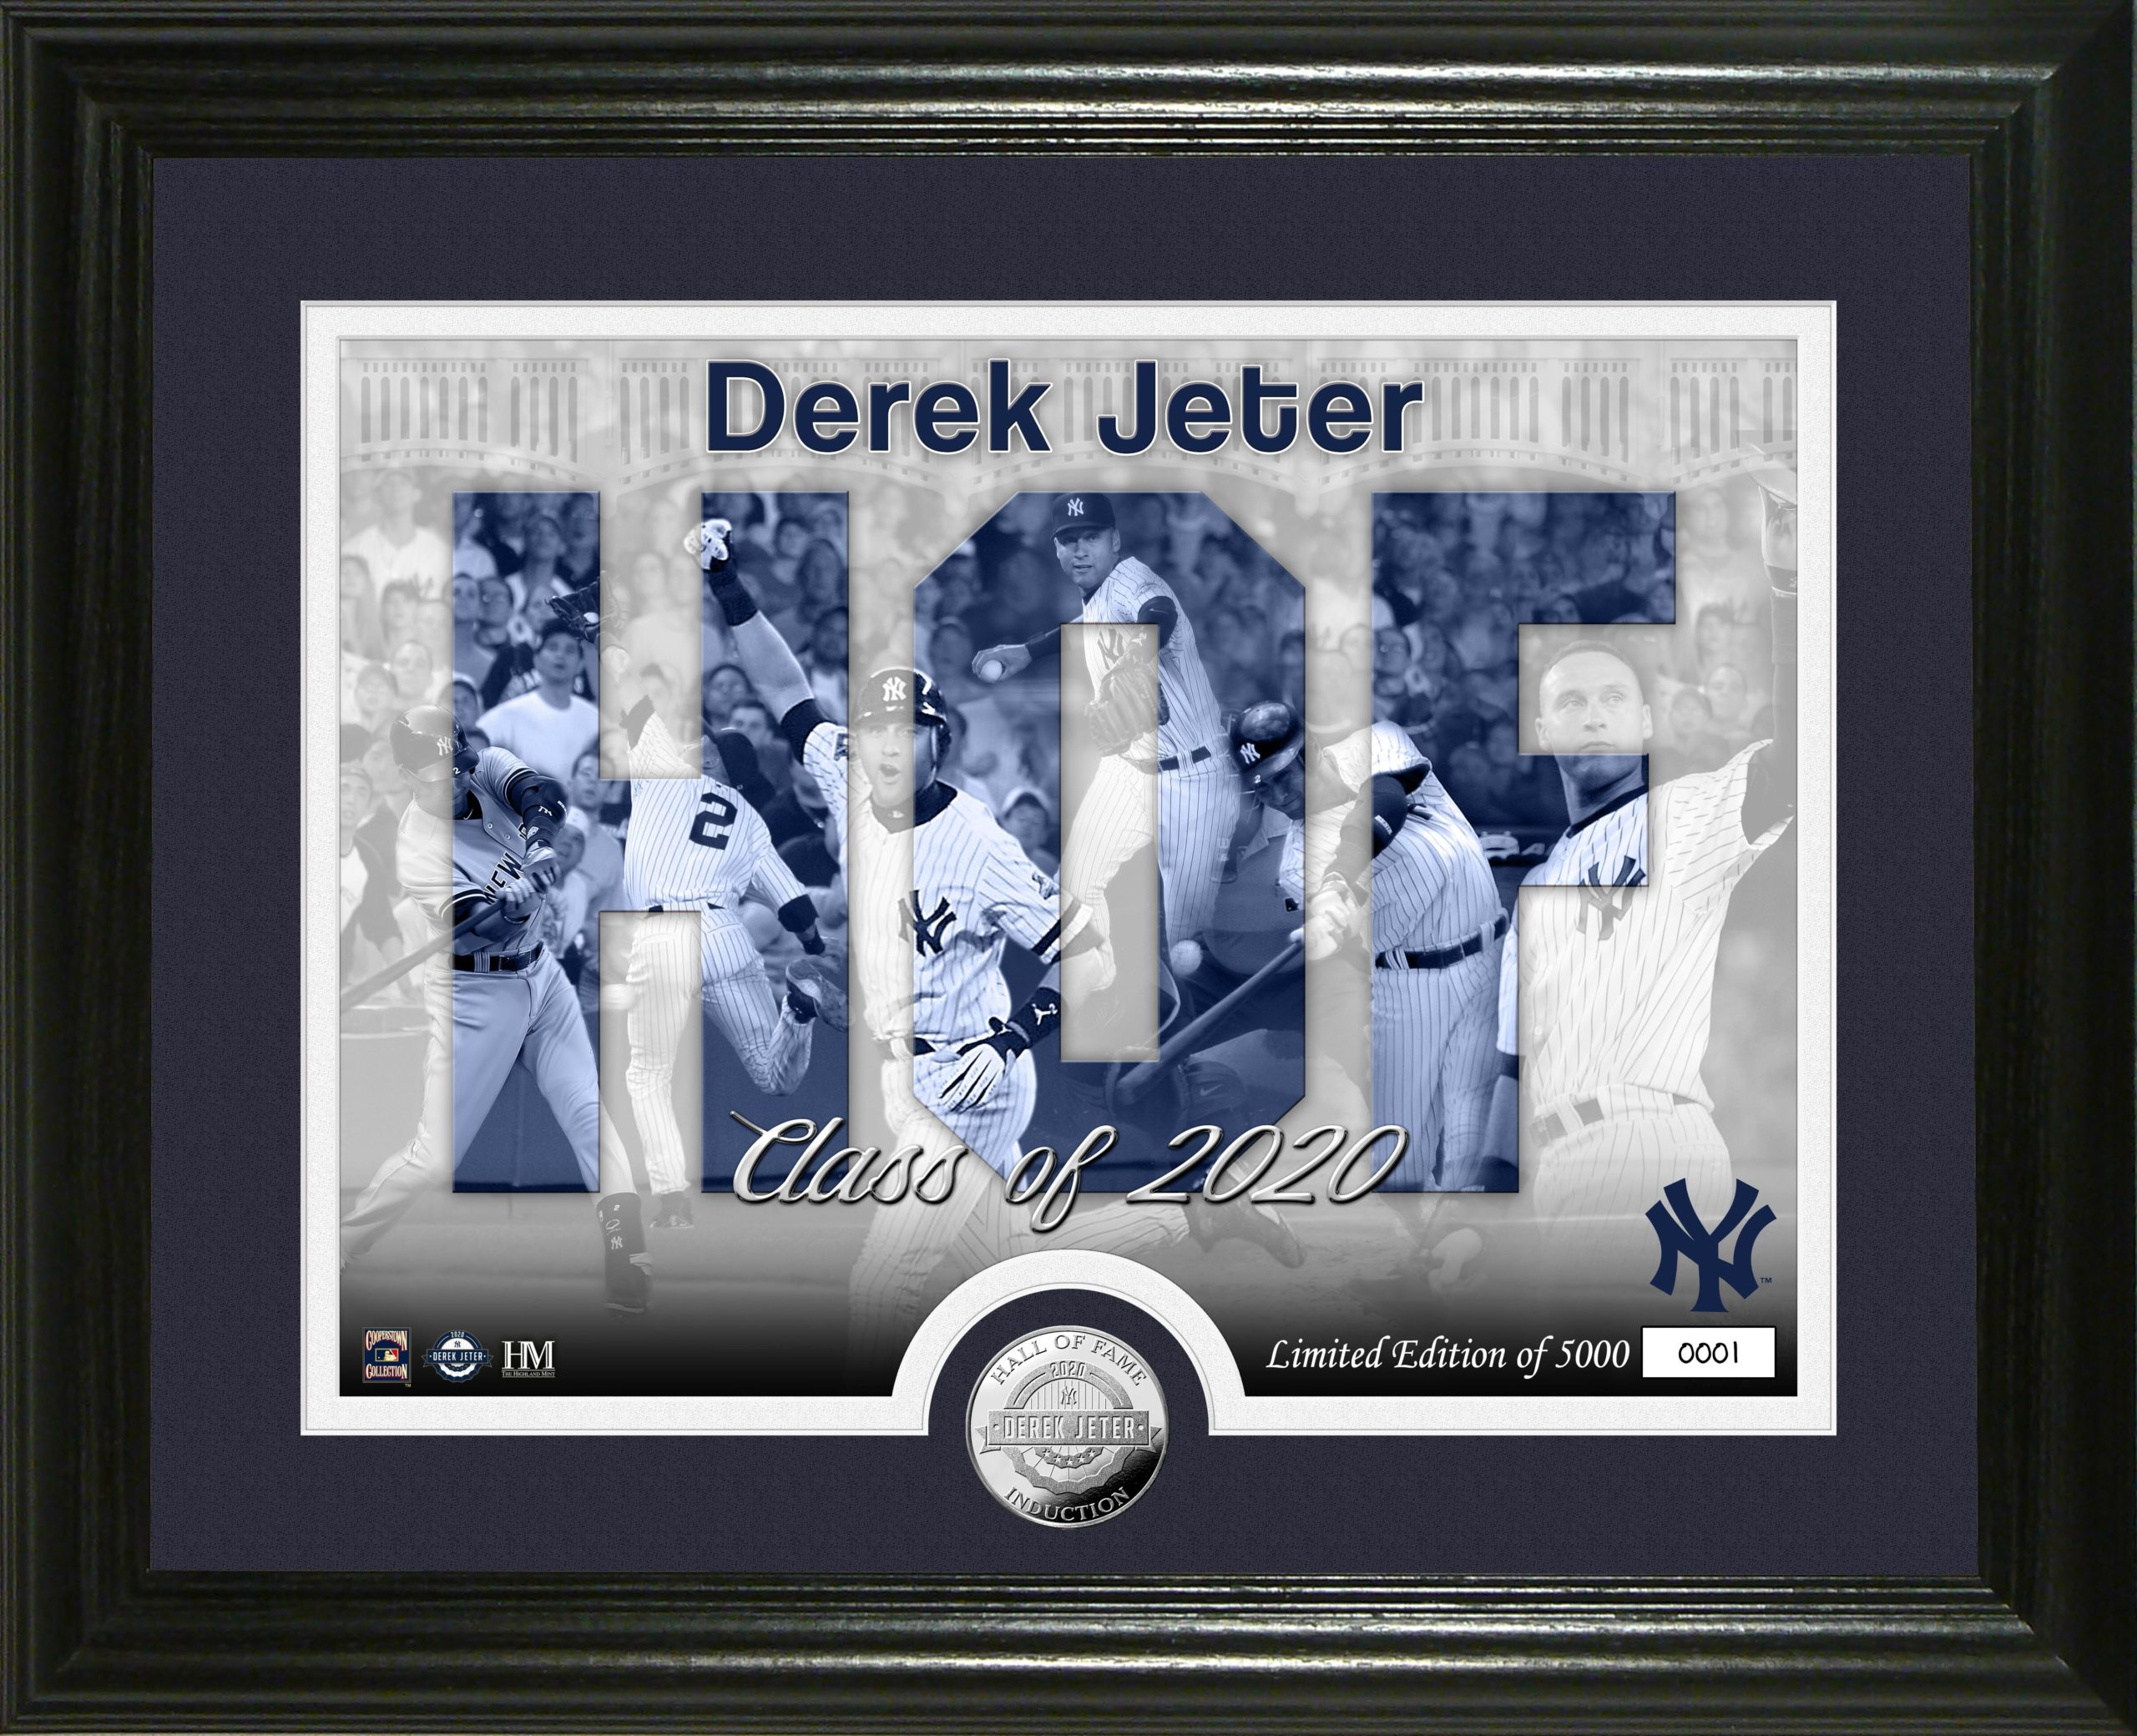 Derek Jeter Yankees HOF class of 2020 8×10 photo framed highland mint coin LE